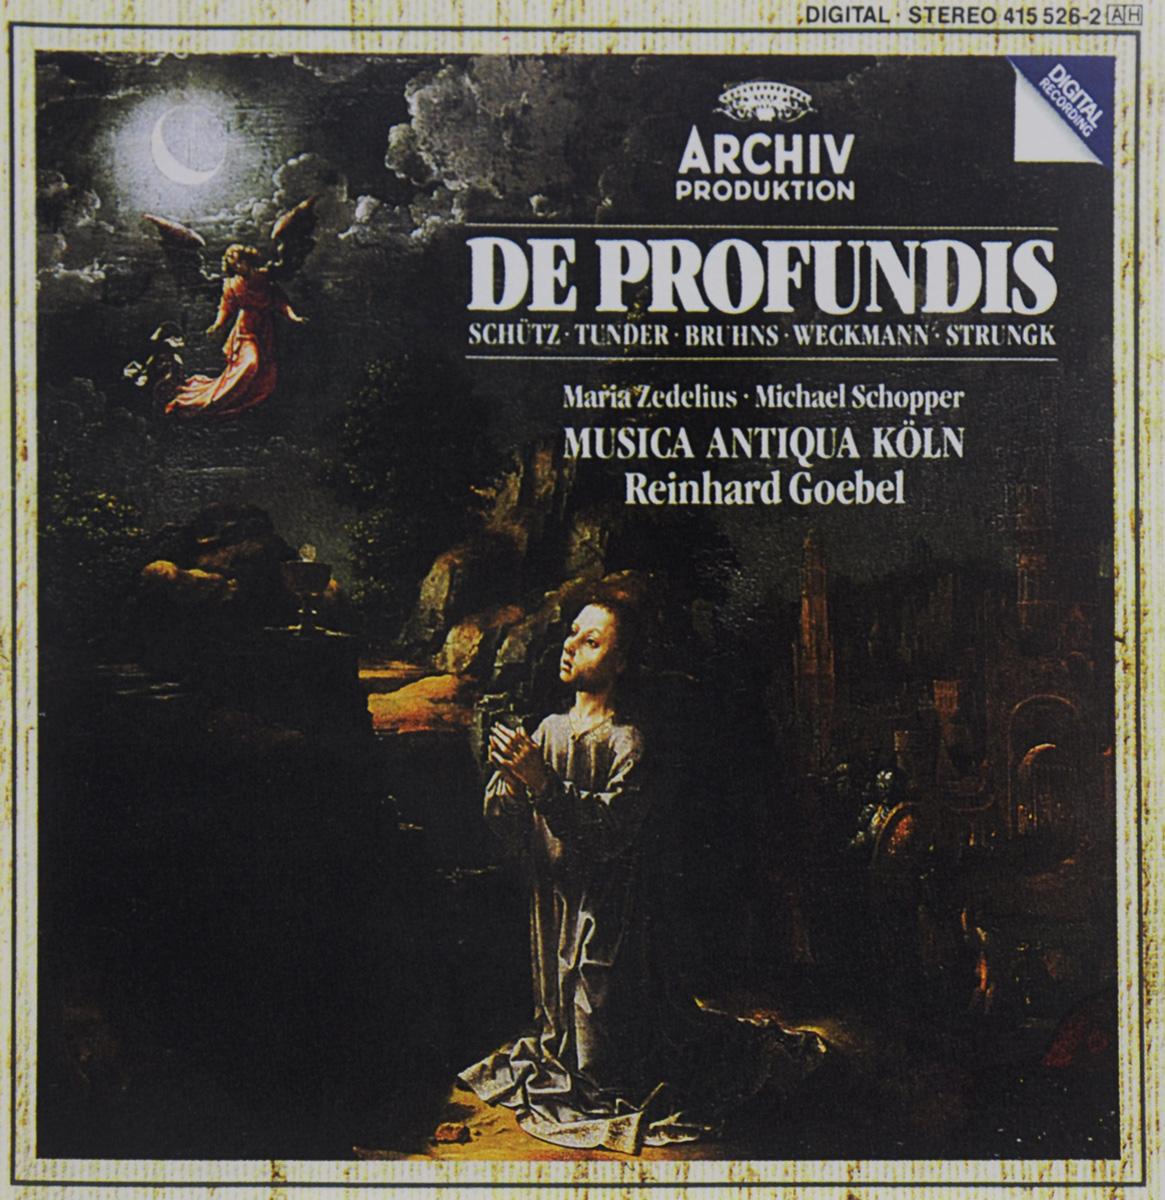 Maria Zedelius,Майкл Шоппер,Musica Antiqua Koln Orchestra,Рейнхард Гебель Reinhard Goebel. De Profundis